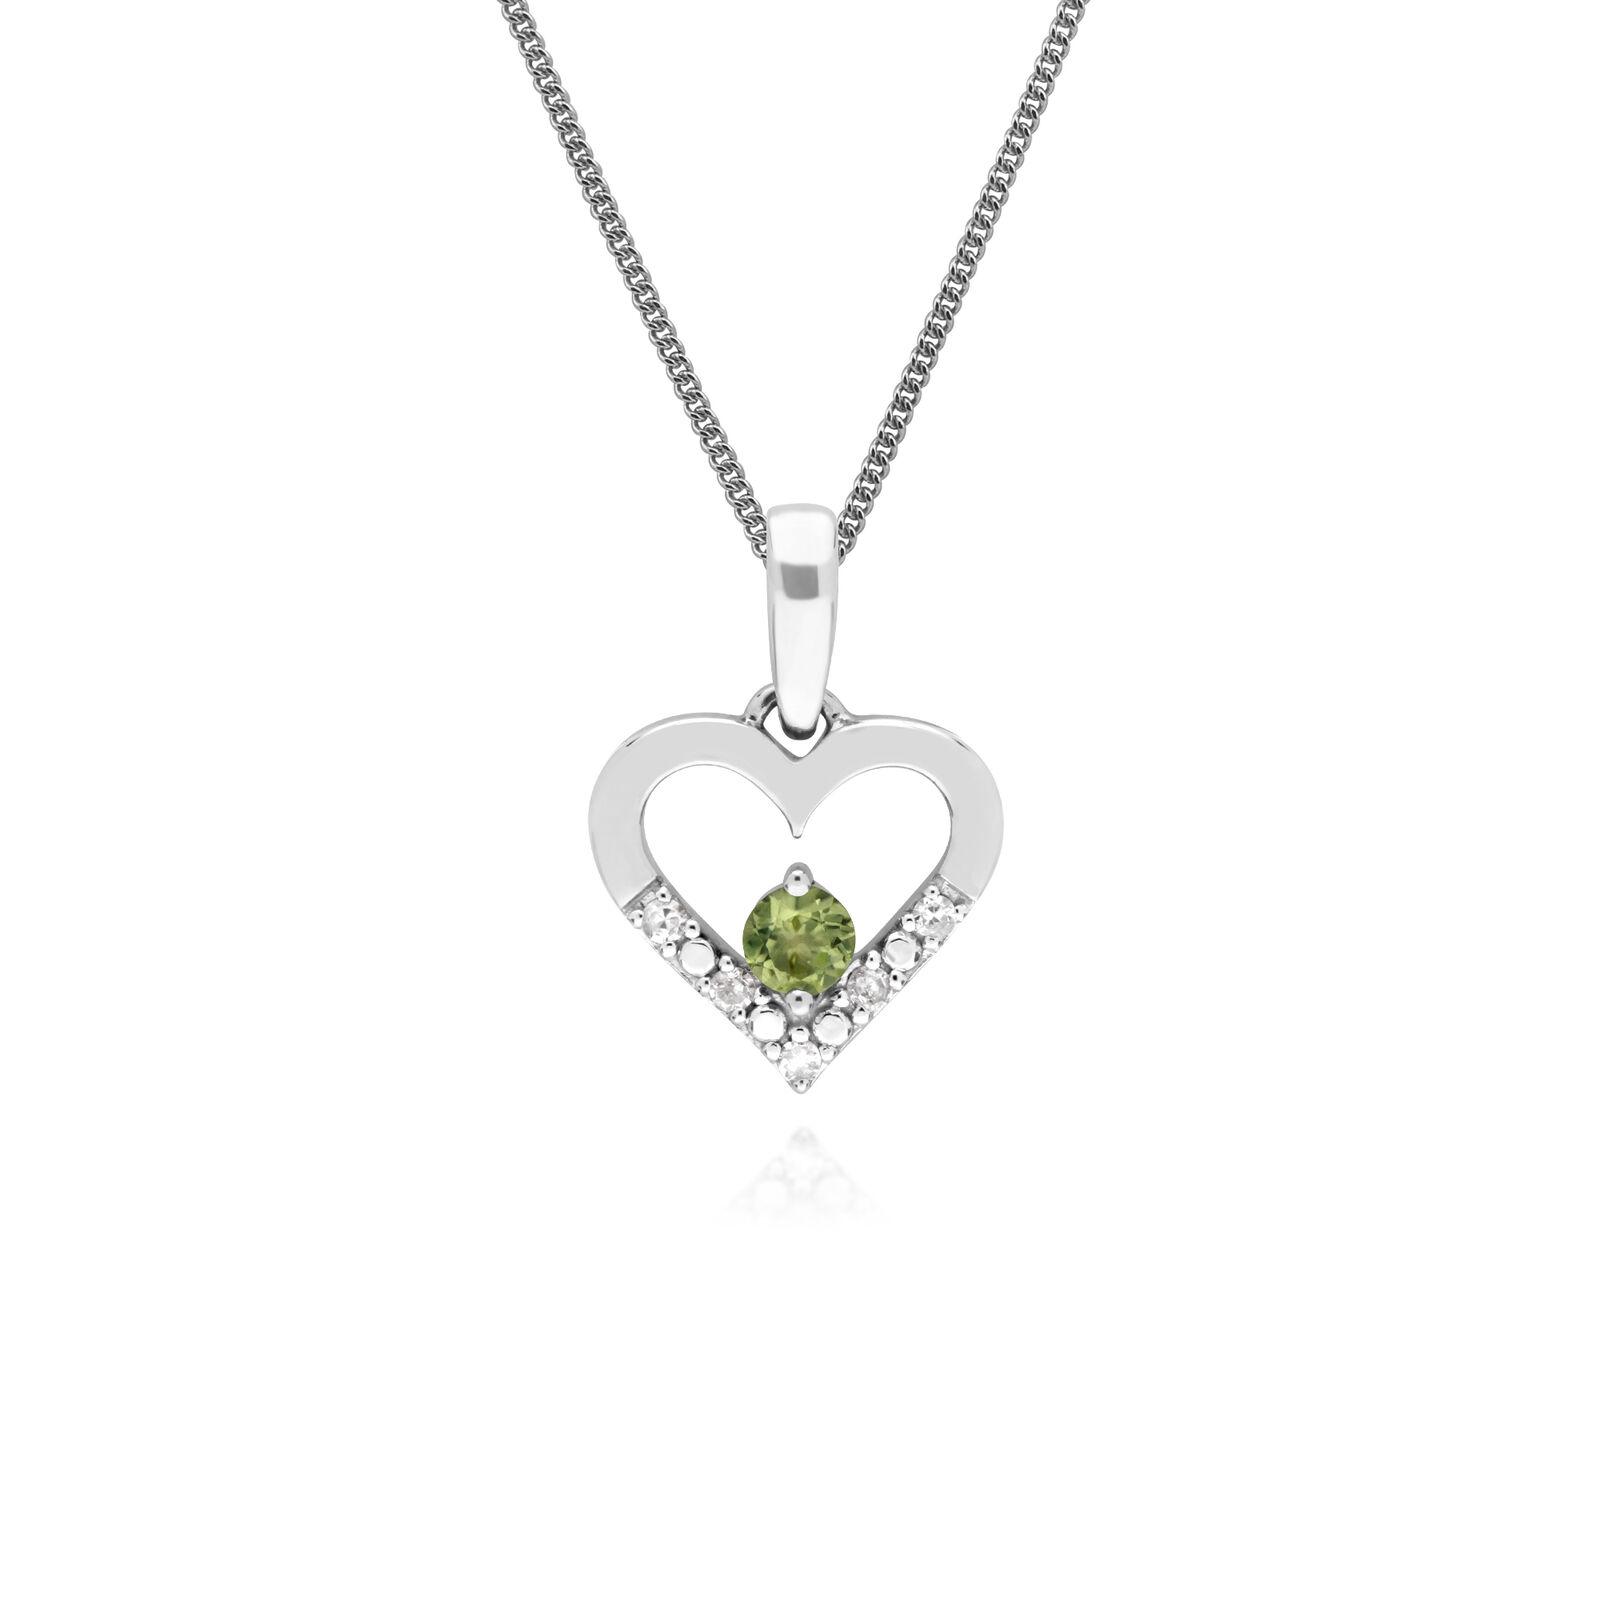 Gemondo 9ct White gold Single Peridot & Diamond Heart Pendant on 45cm Chain